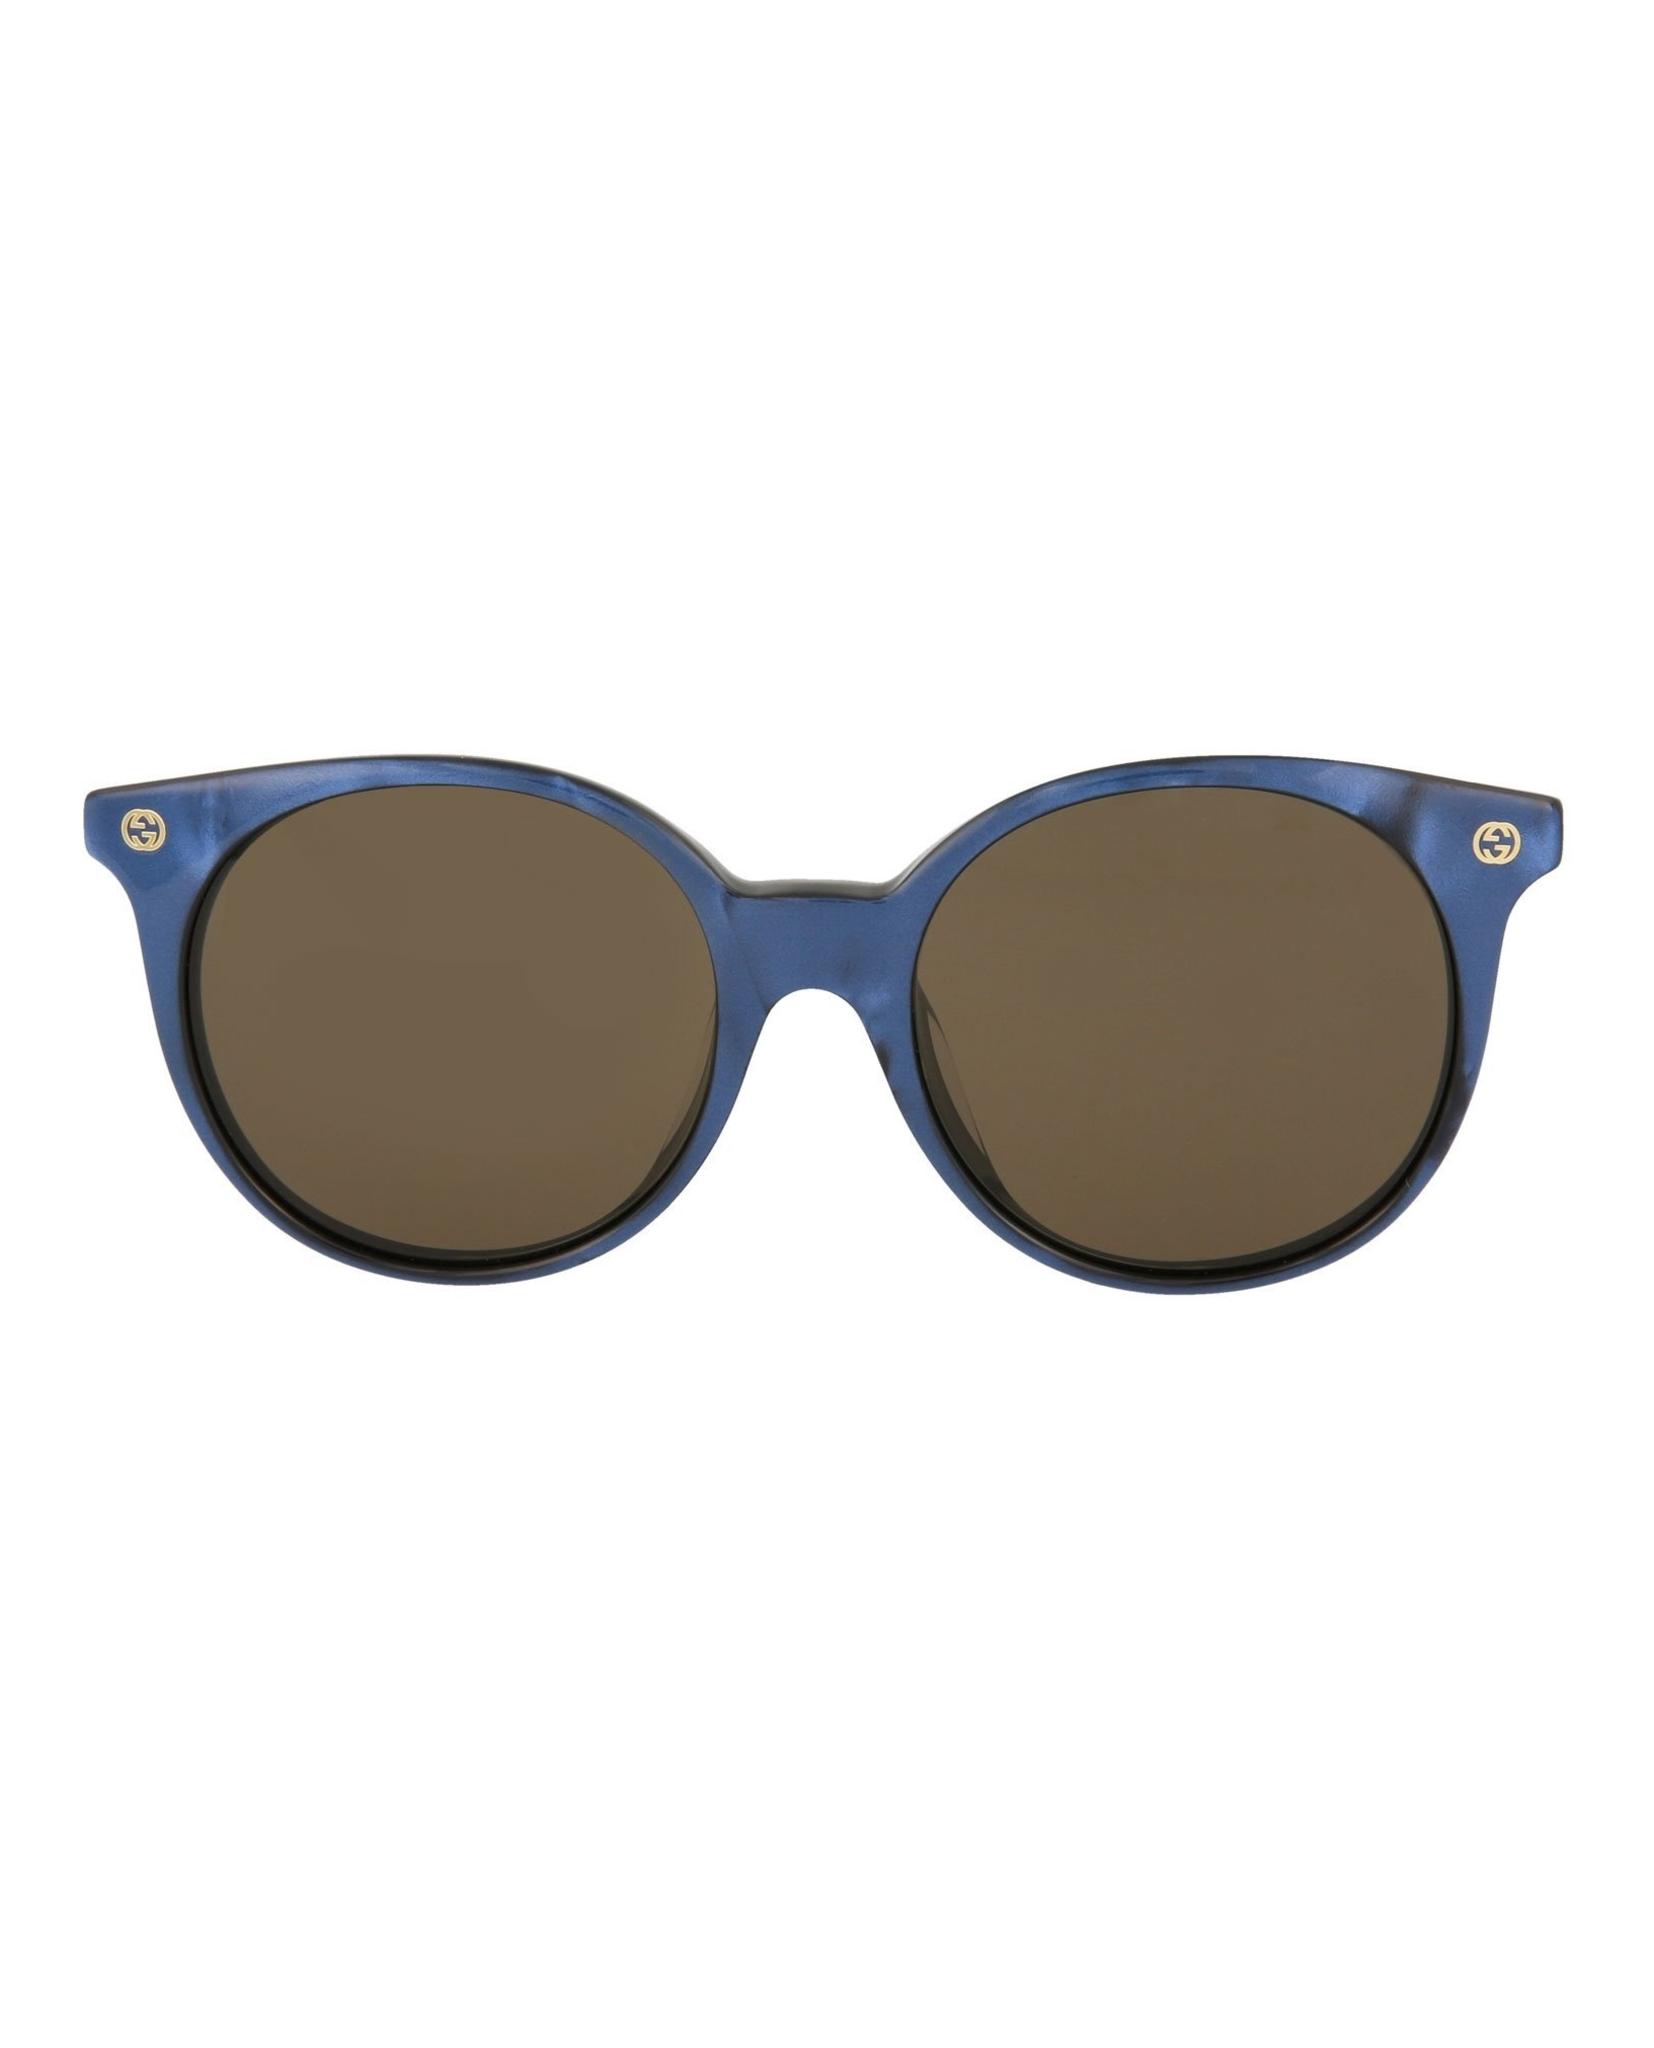 d6a2a78dd1 Gucci Womens Round Oval Sunglasses GG0091SA-30001509-004 ...